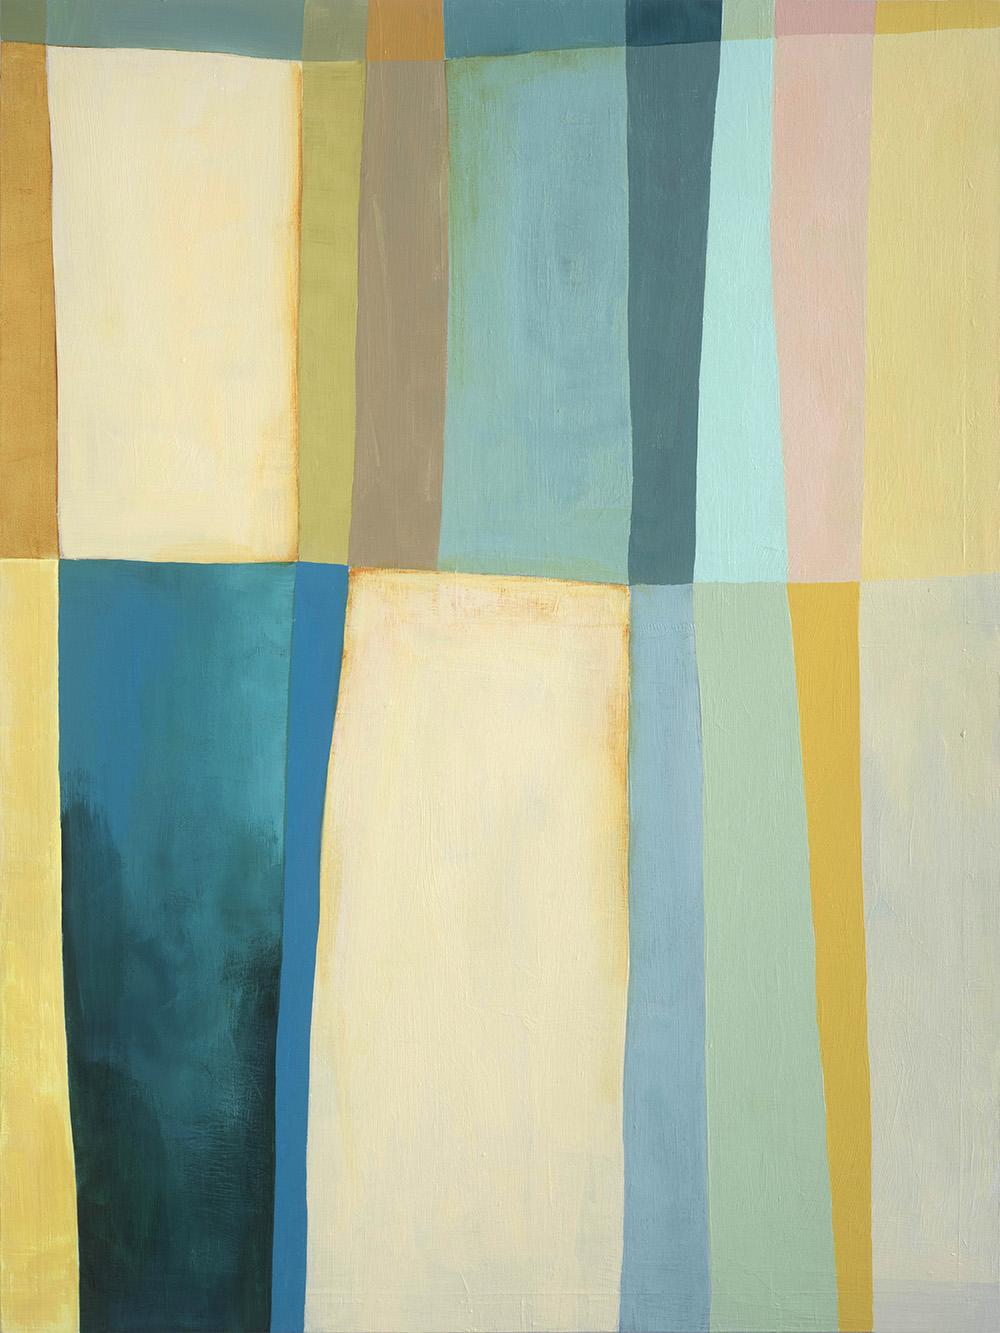 Jane Davies - Stitched Together #4